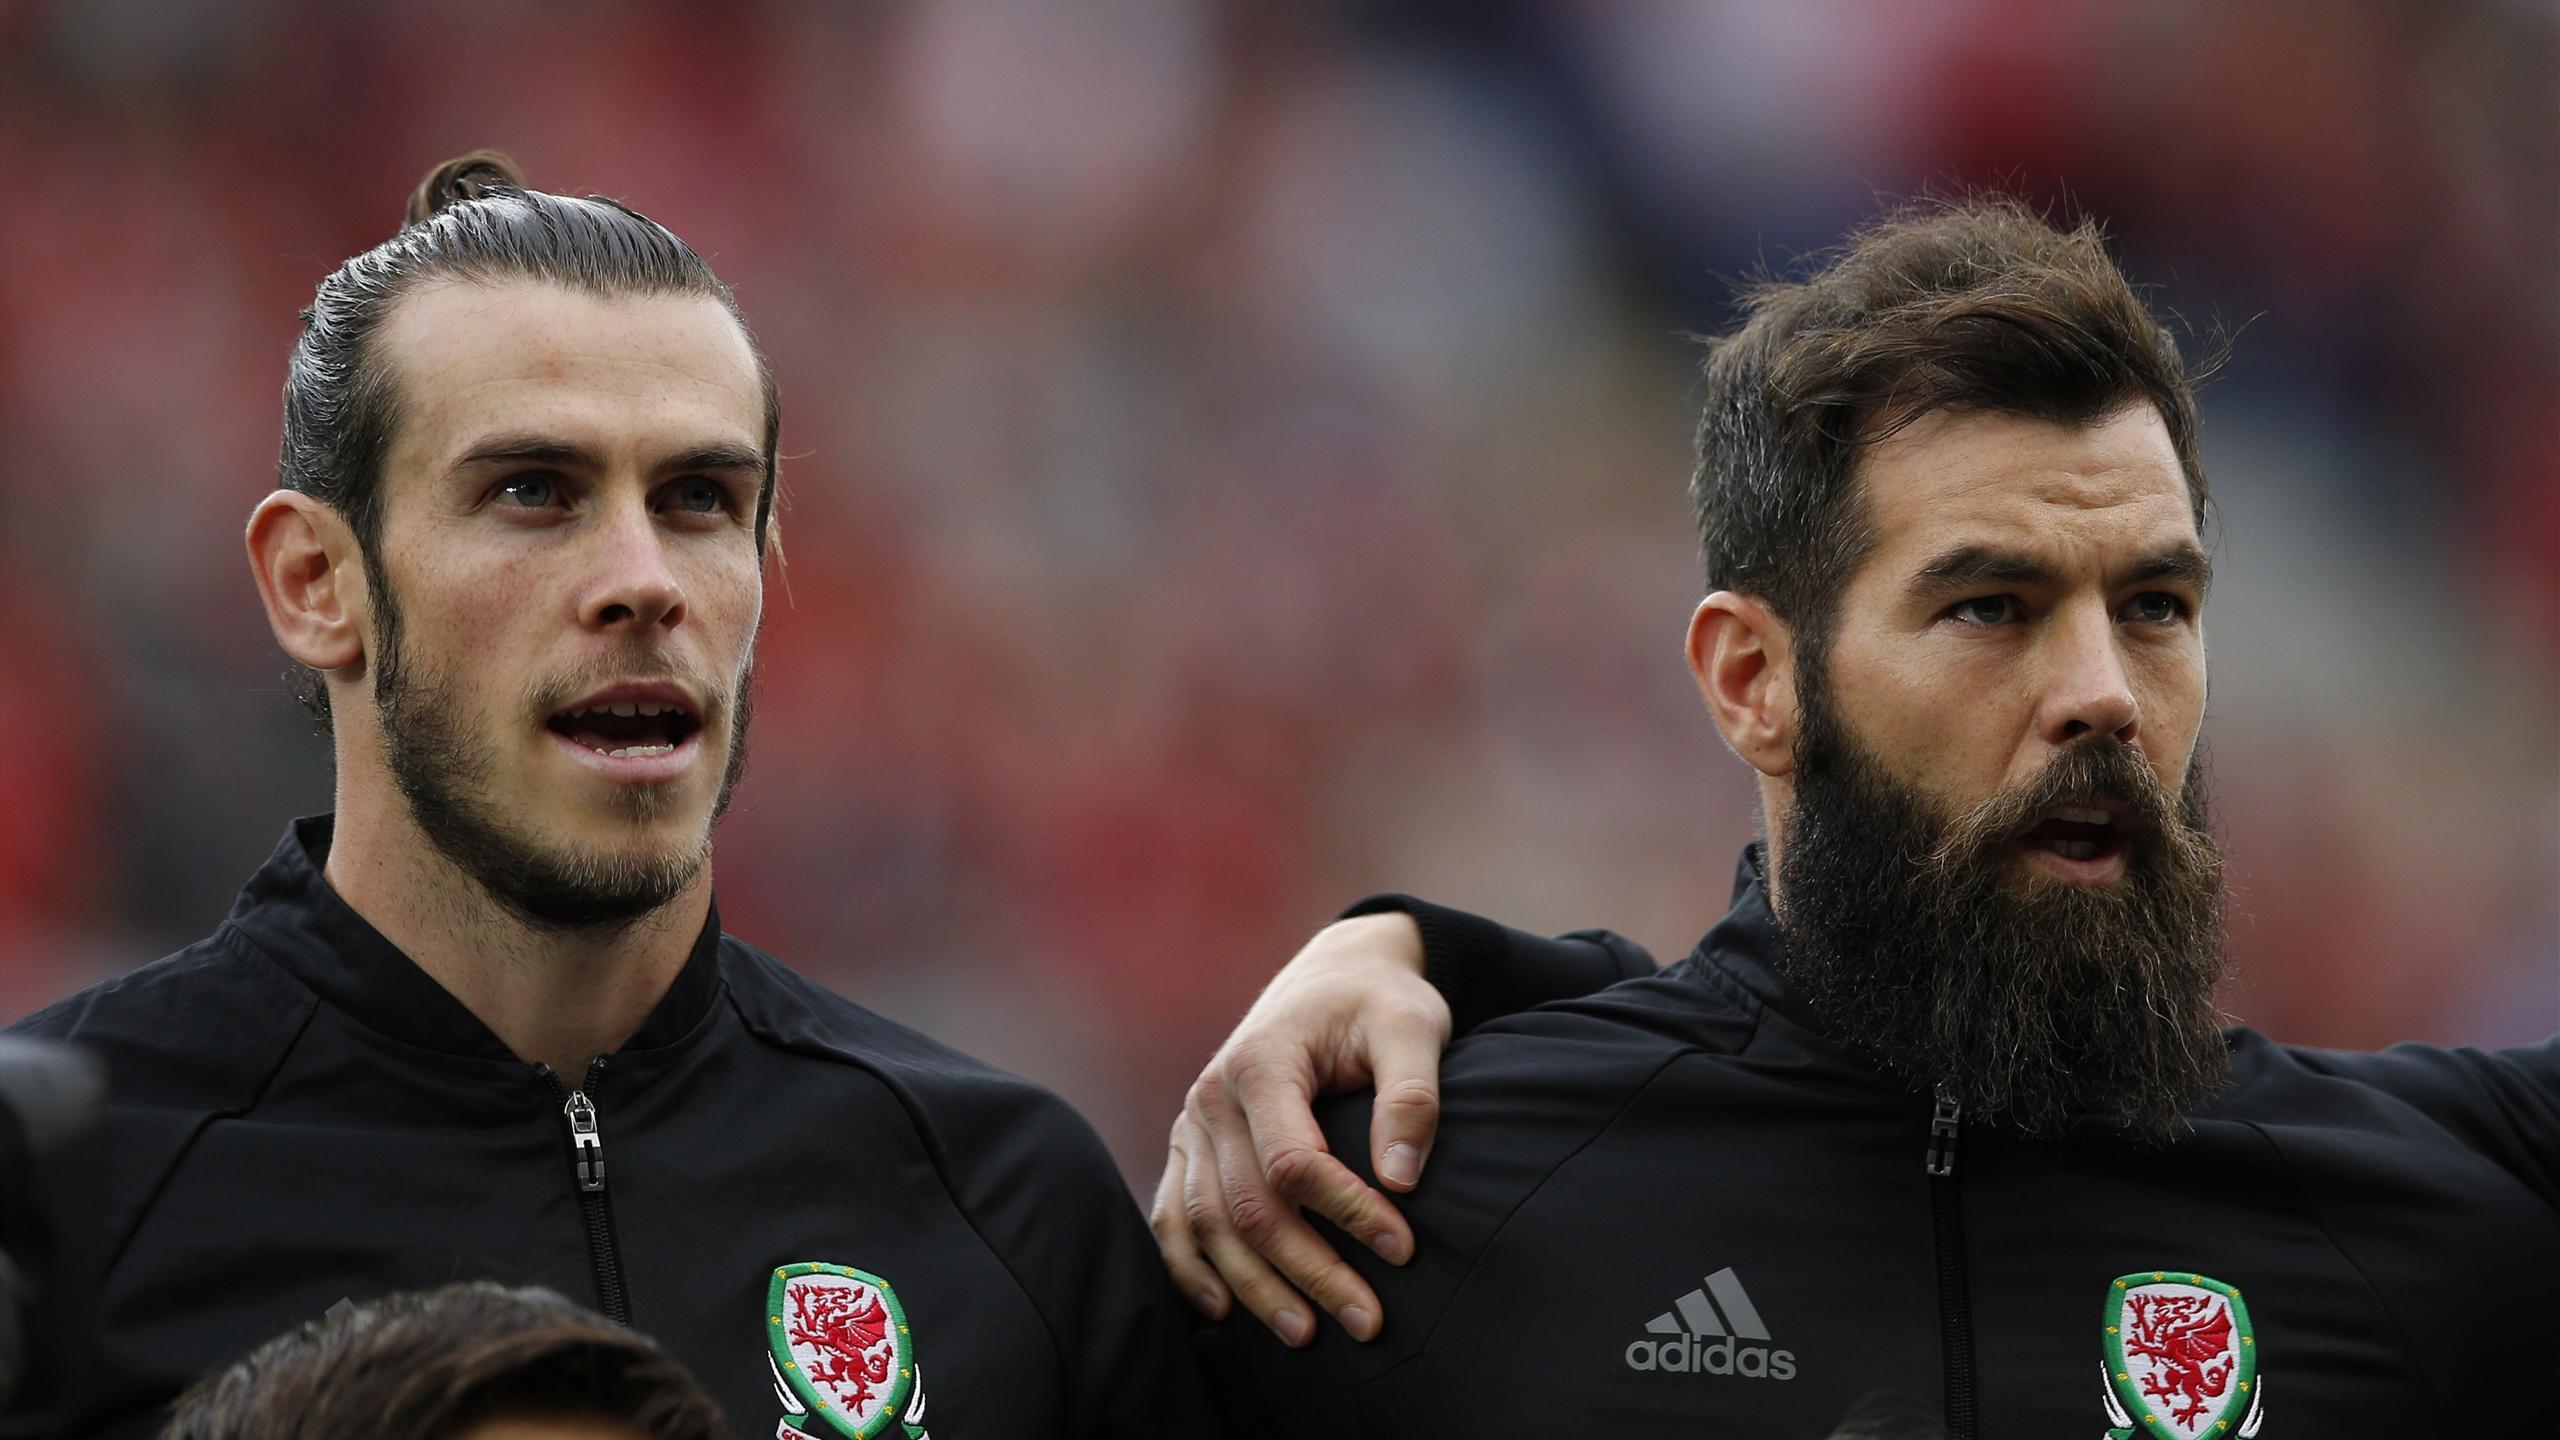 Wales' Gareth Bale, Joe Ledley and teammates line up before the match against Georgia